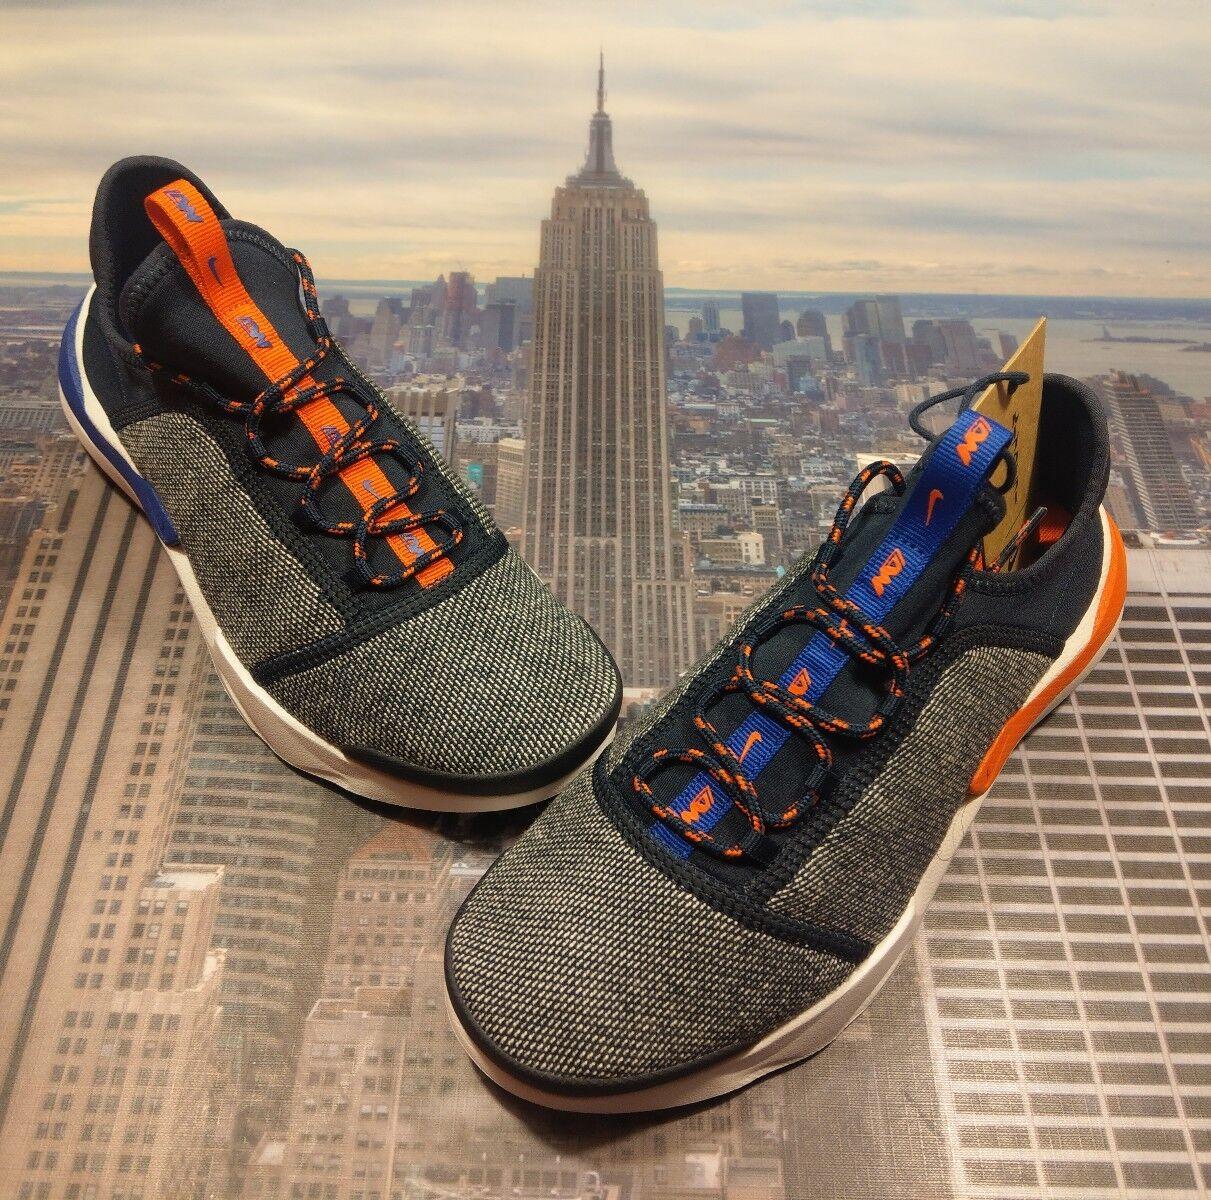 Nike NikeLab Shift One LW LoopWheeler Japan Obsidian Mens Size 7 AQ2440 400 New